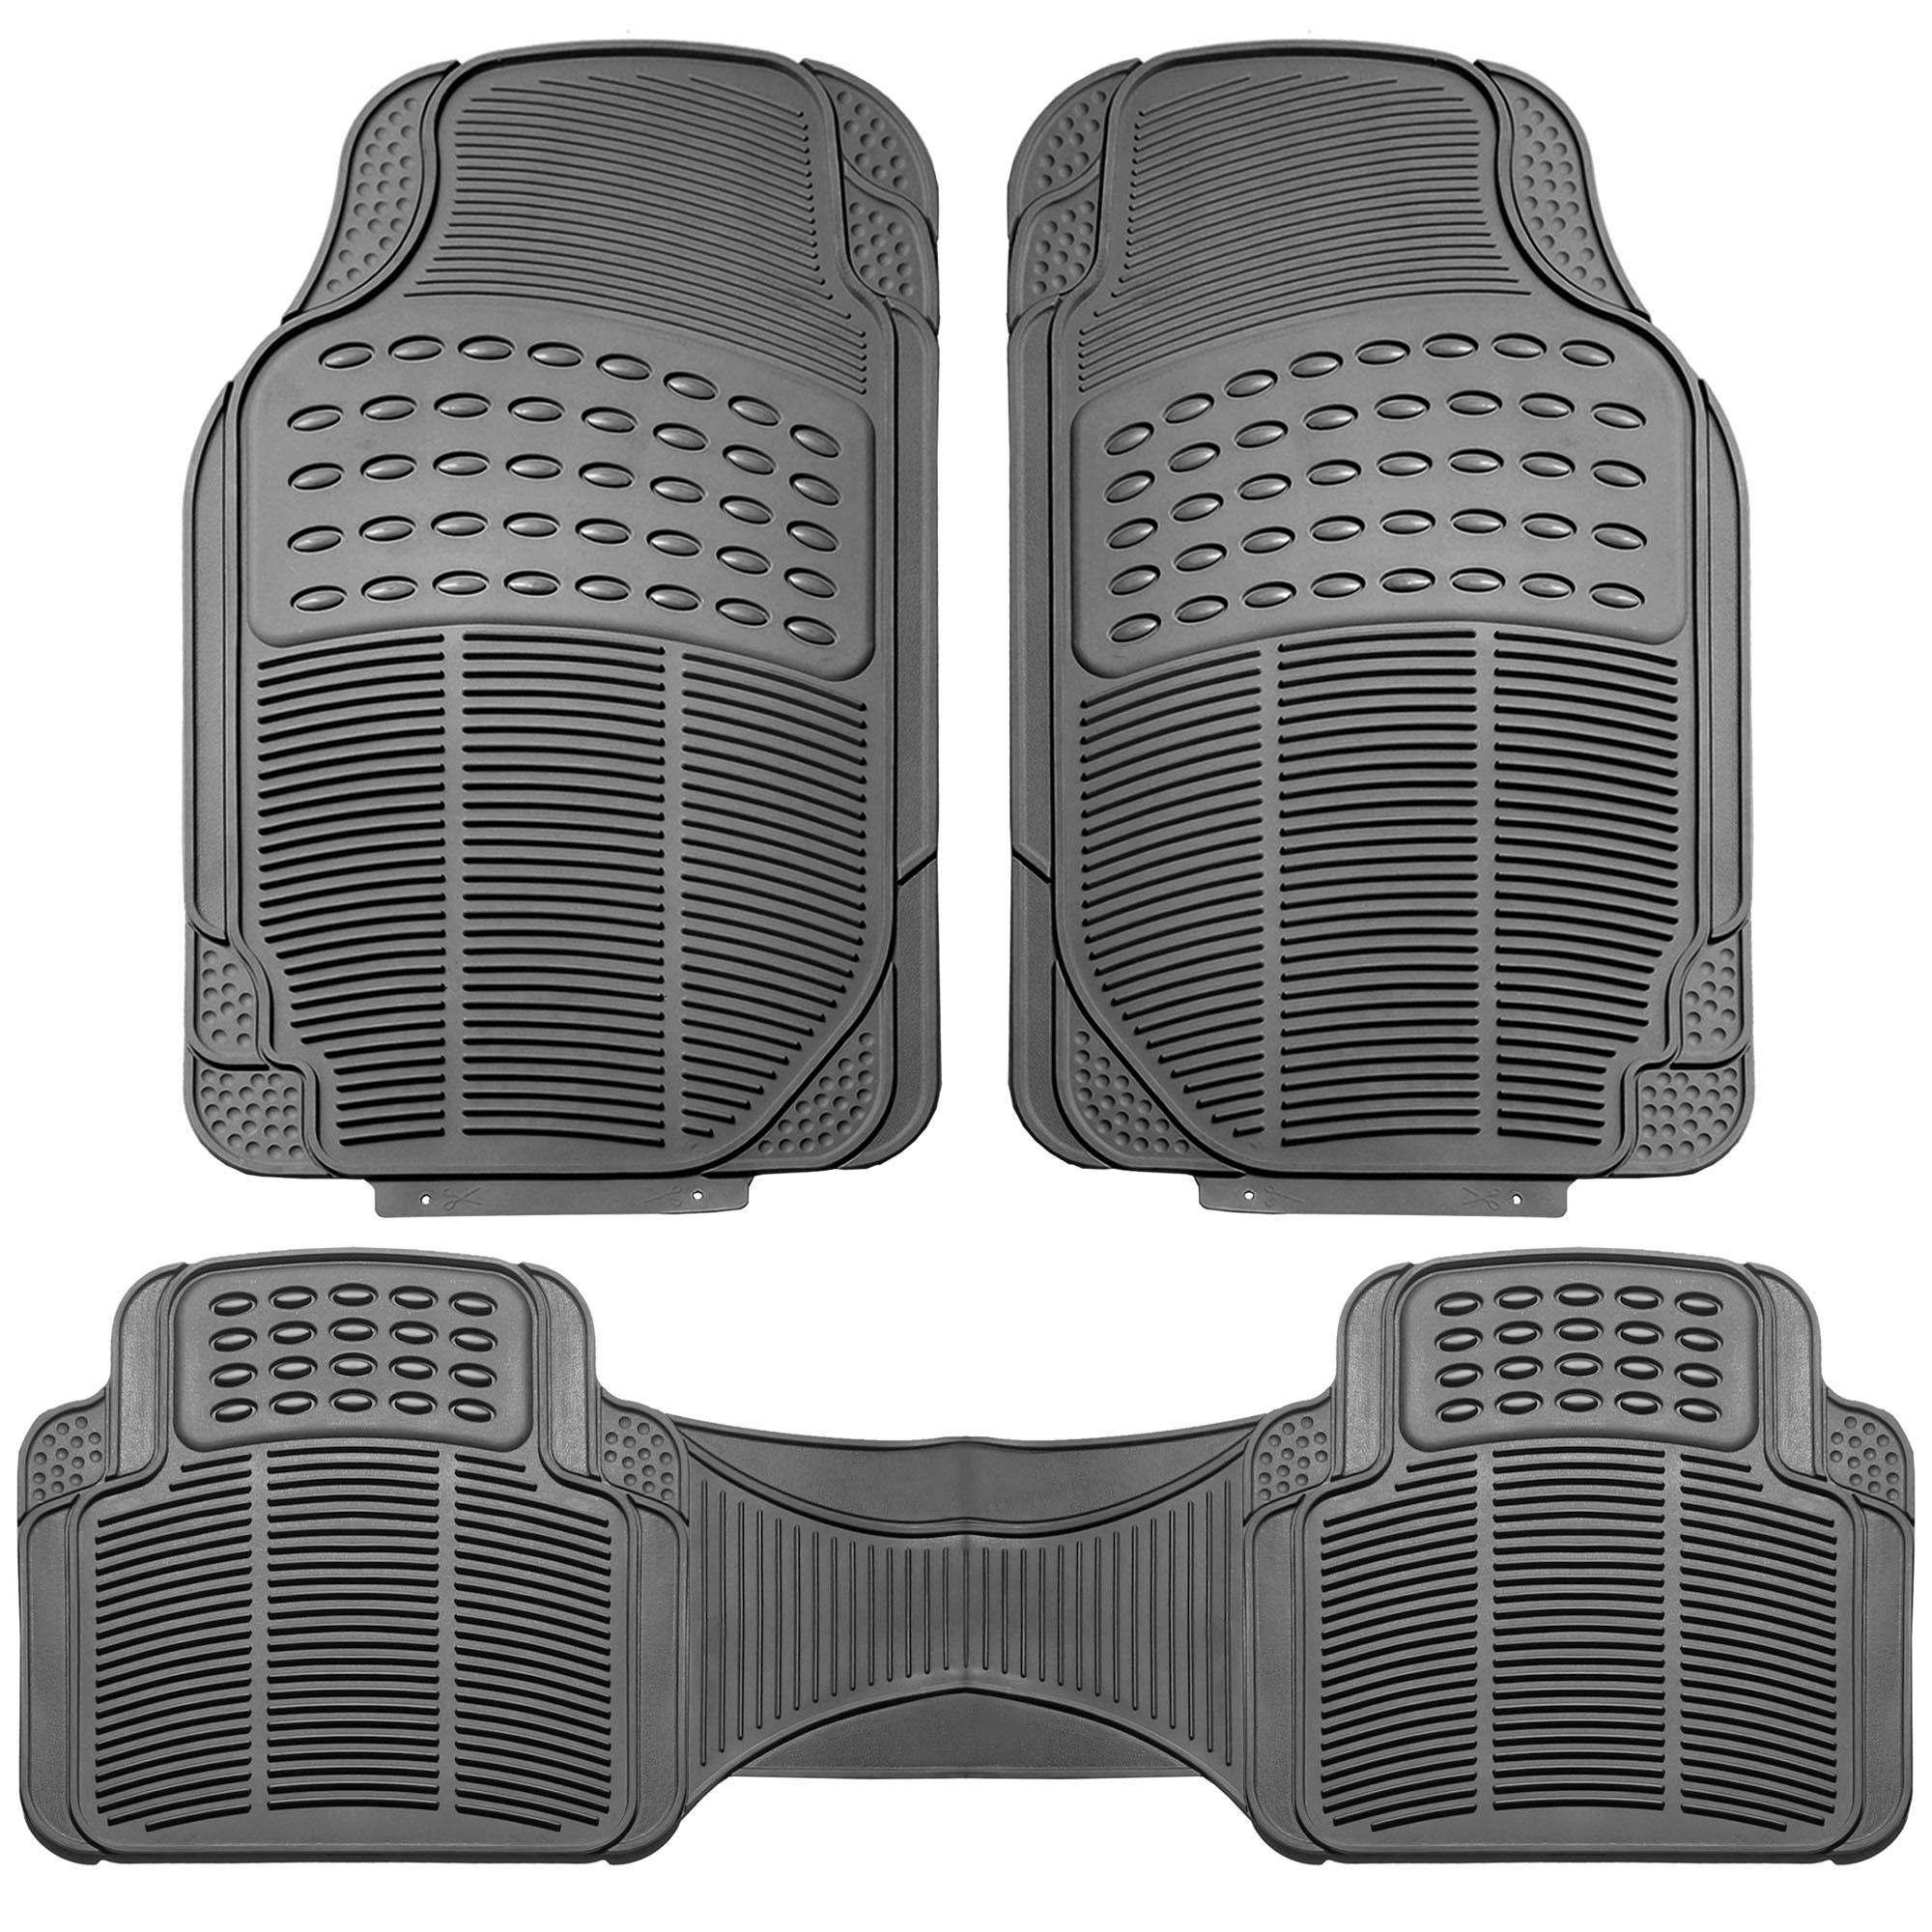 3pc-Floor-Mats-for-Auto-Car-SUV-Van-Heavy-Duty-3-Colors-w-Free-Gift thumbnail 18